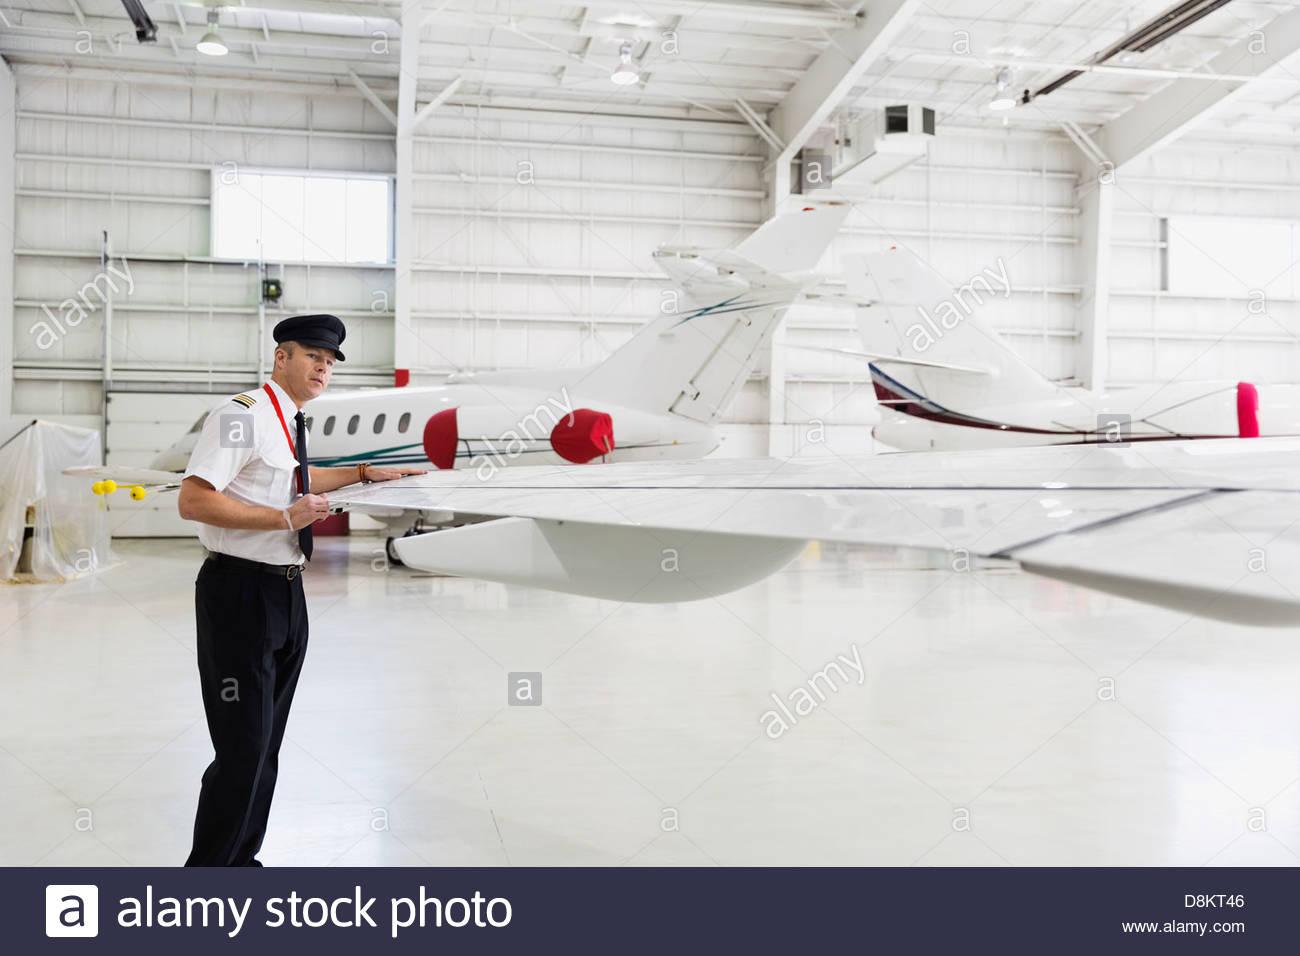 Male pilot checking airplane wing in hangar - Stock Image